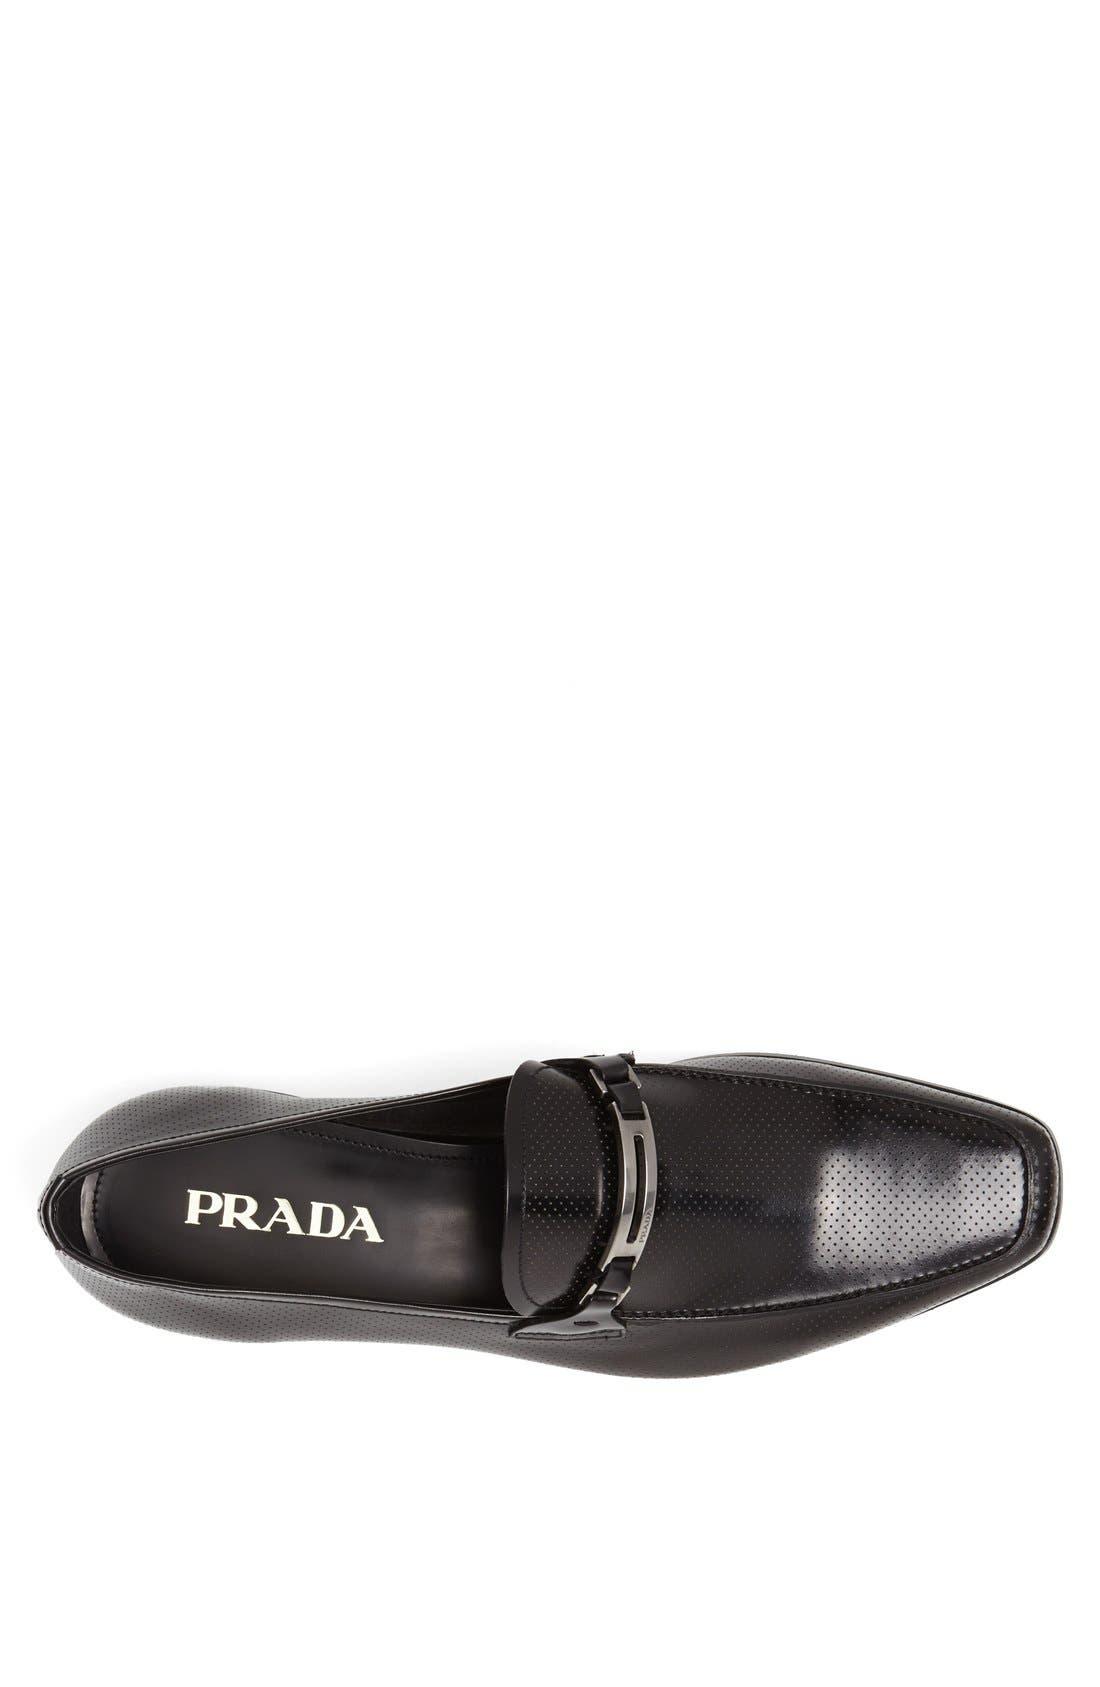 Alternate Image 3  - Prada Leather Bit Loafer